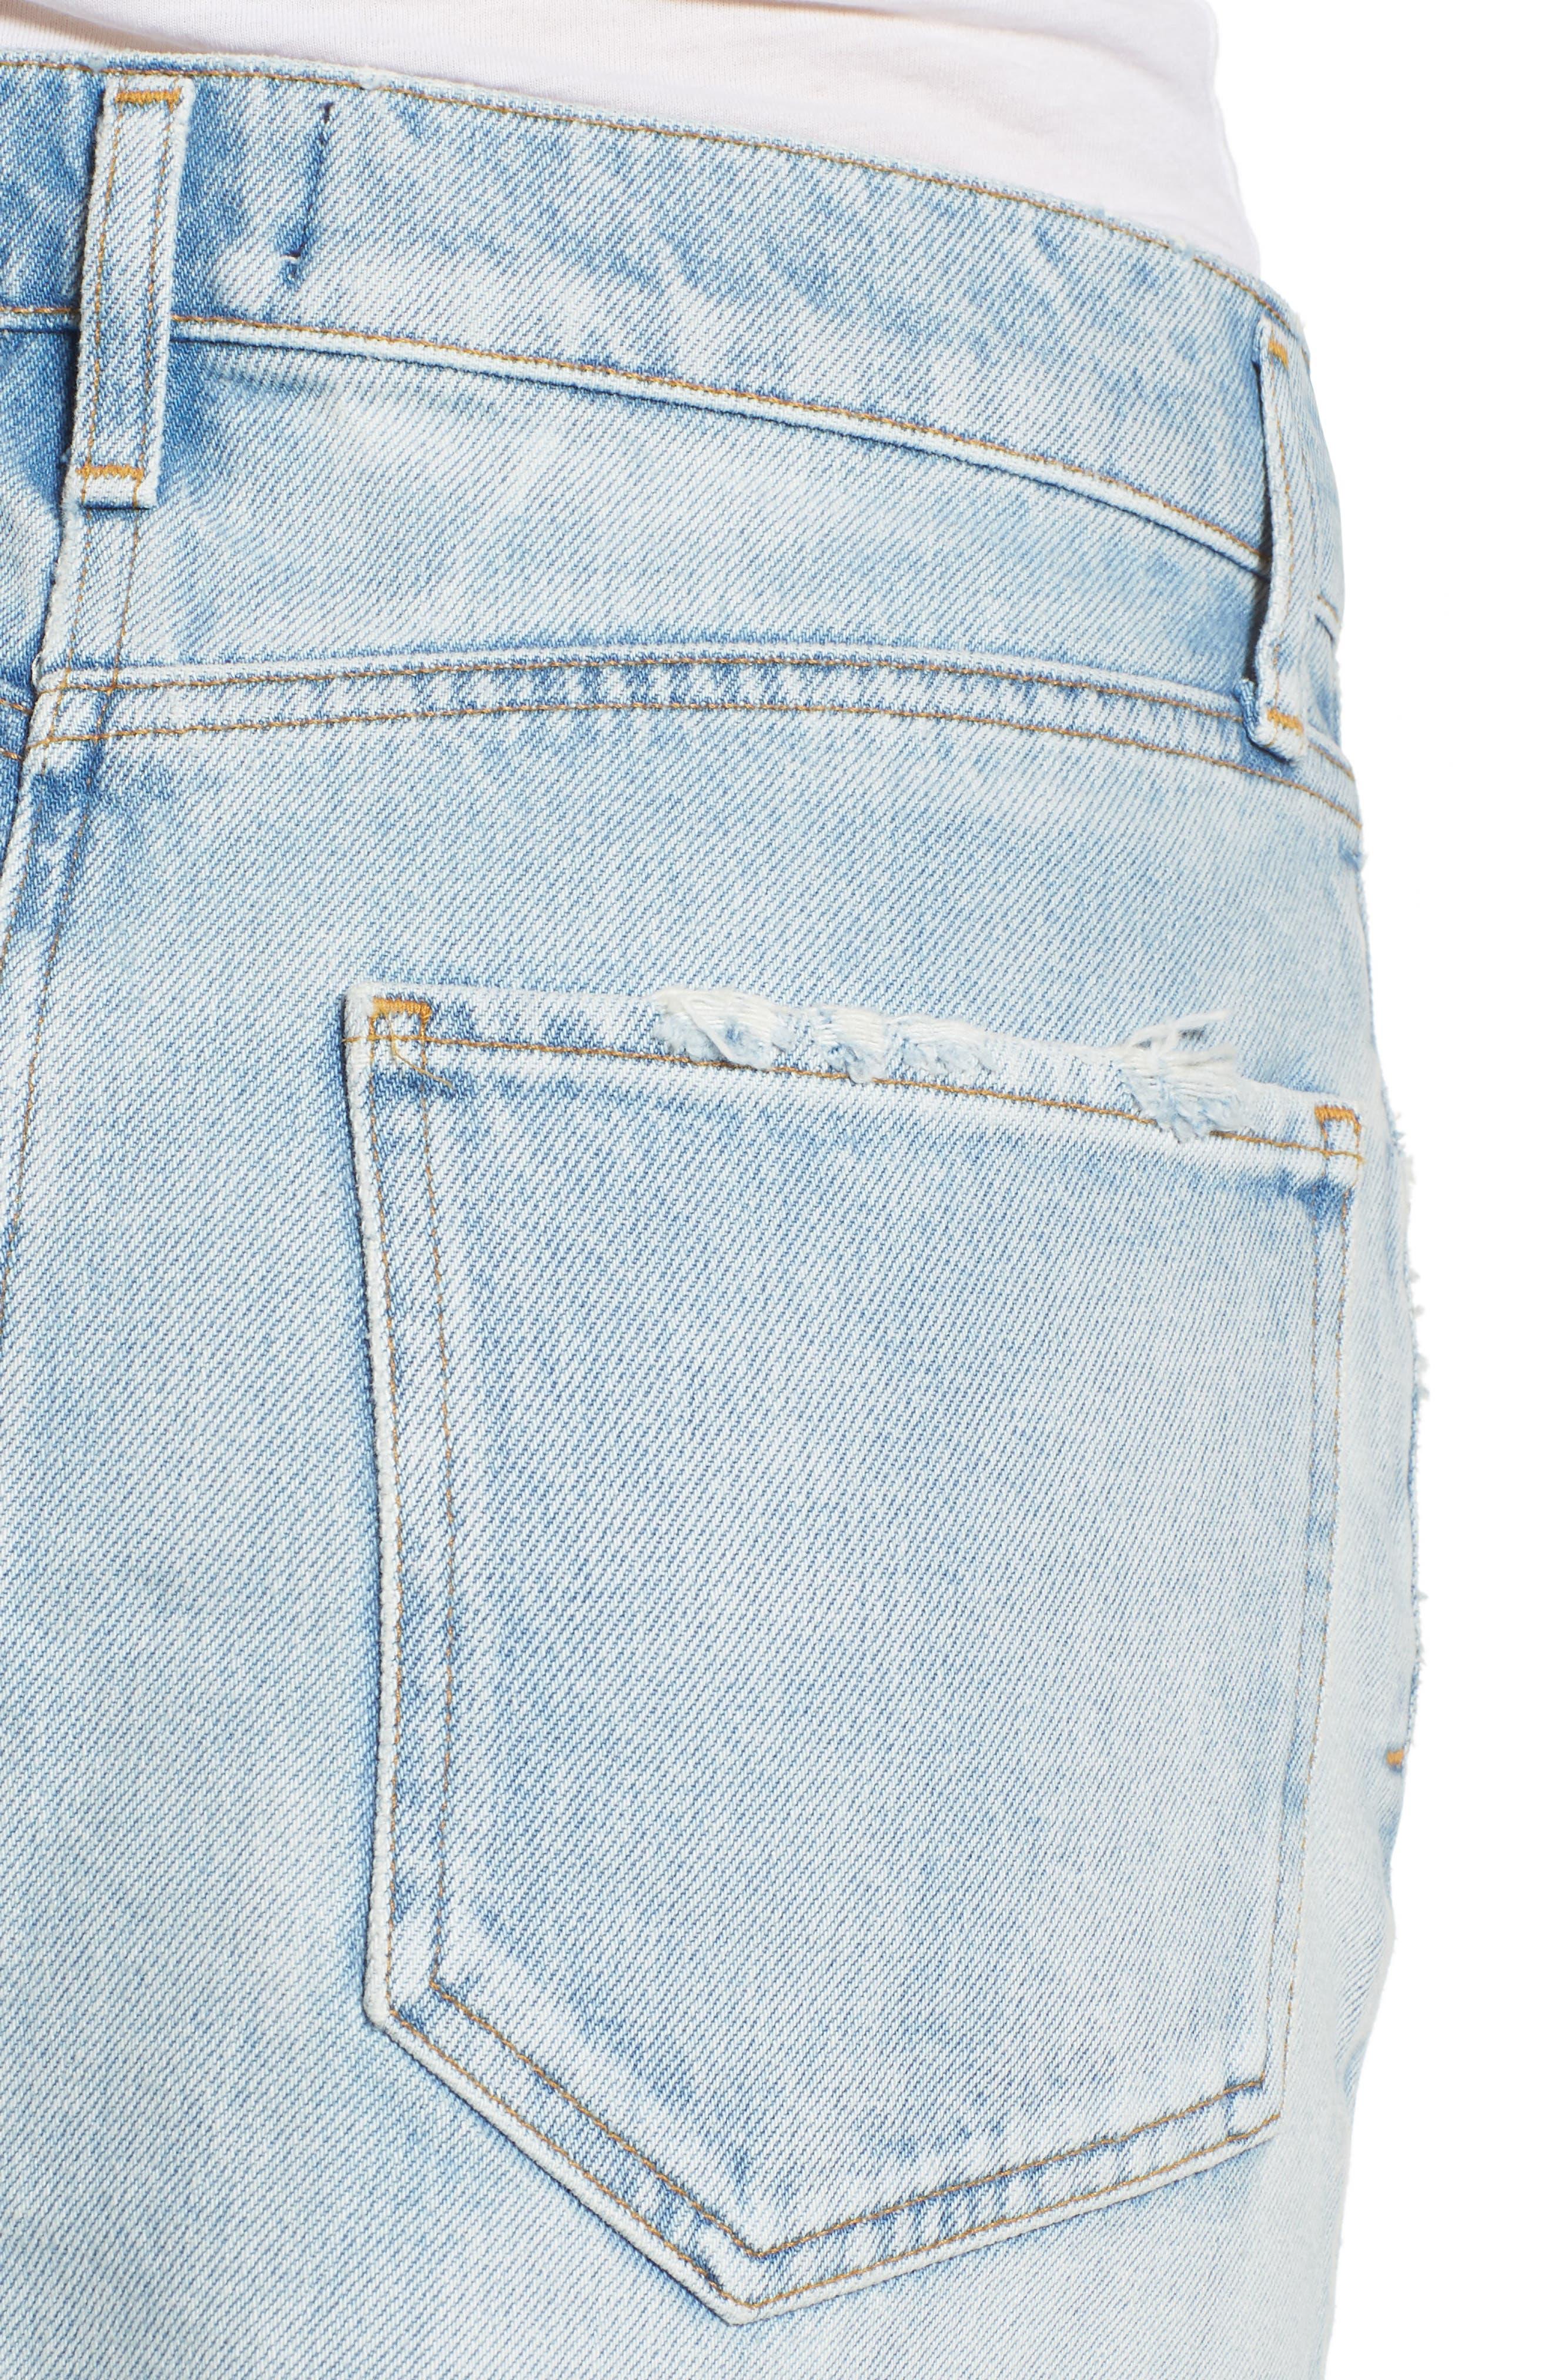 Quinn High Waist Cutoff Denim Miniskirt,                             Alternate thumbnail 4, color,                             VEGA